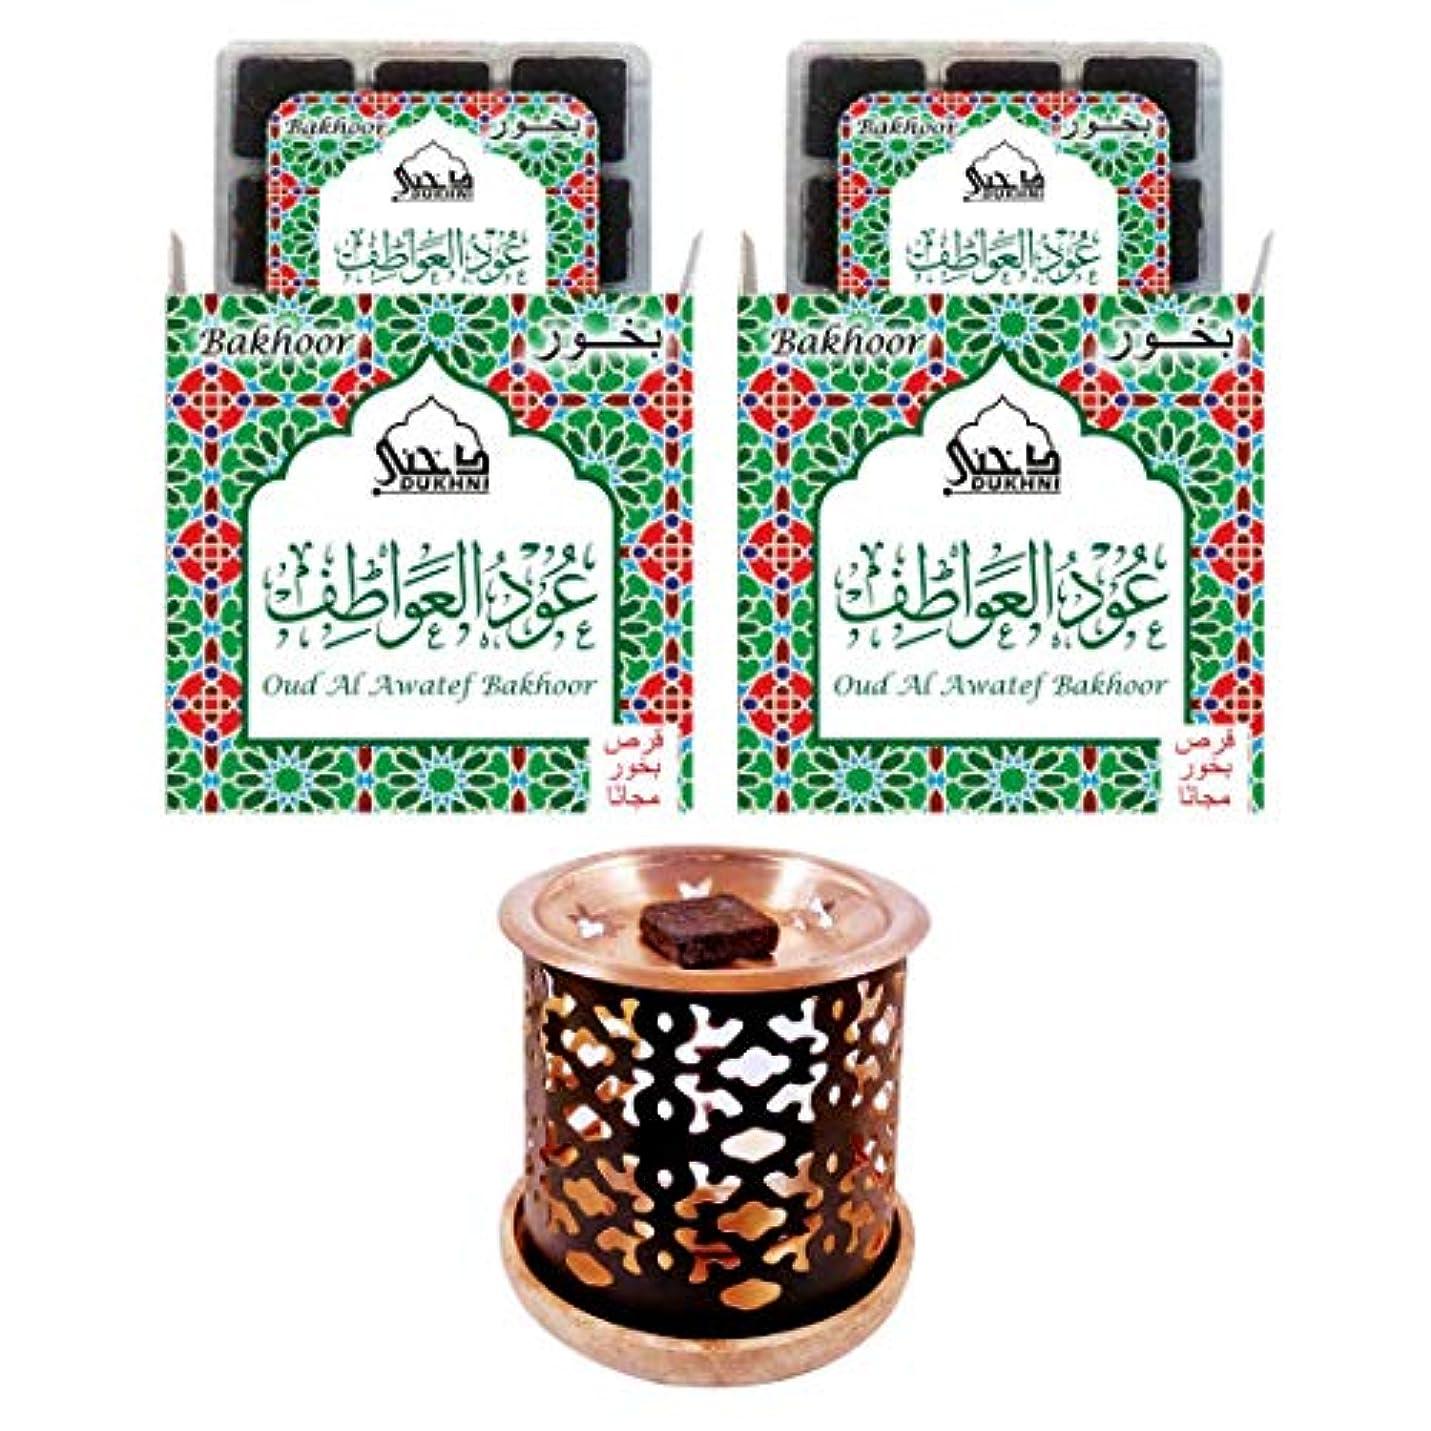 Dukhni DUK-Oud Al Awatef Bakhoor (M) + スノーフレーク エキゾチックな香炉 燃焼